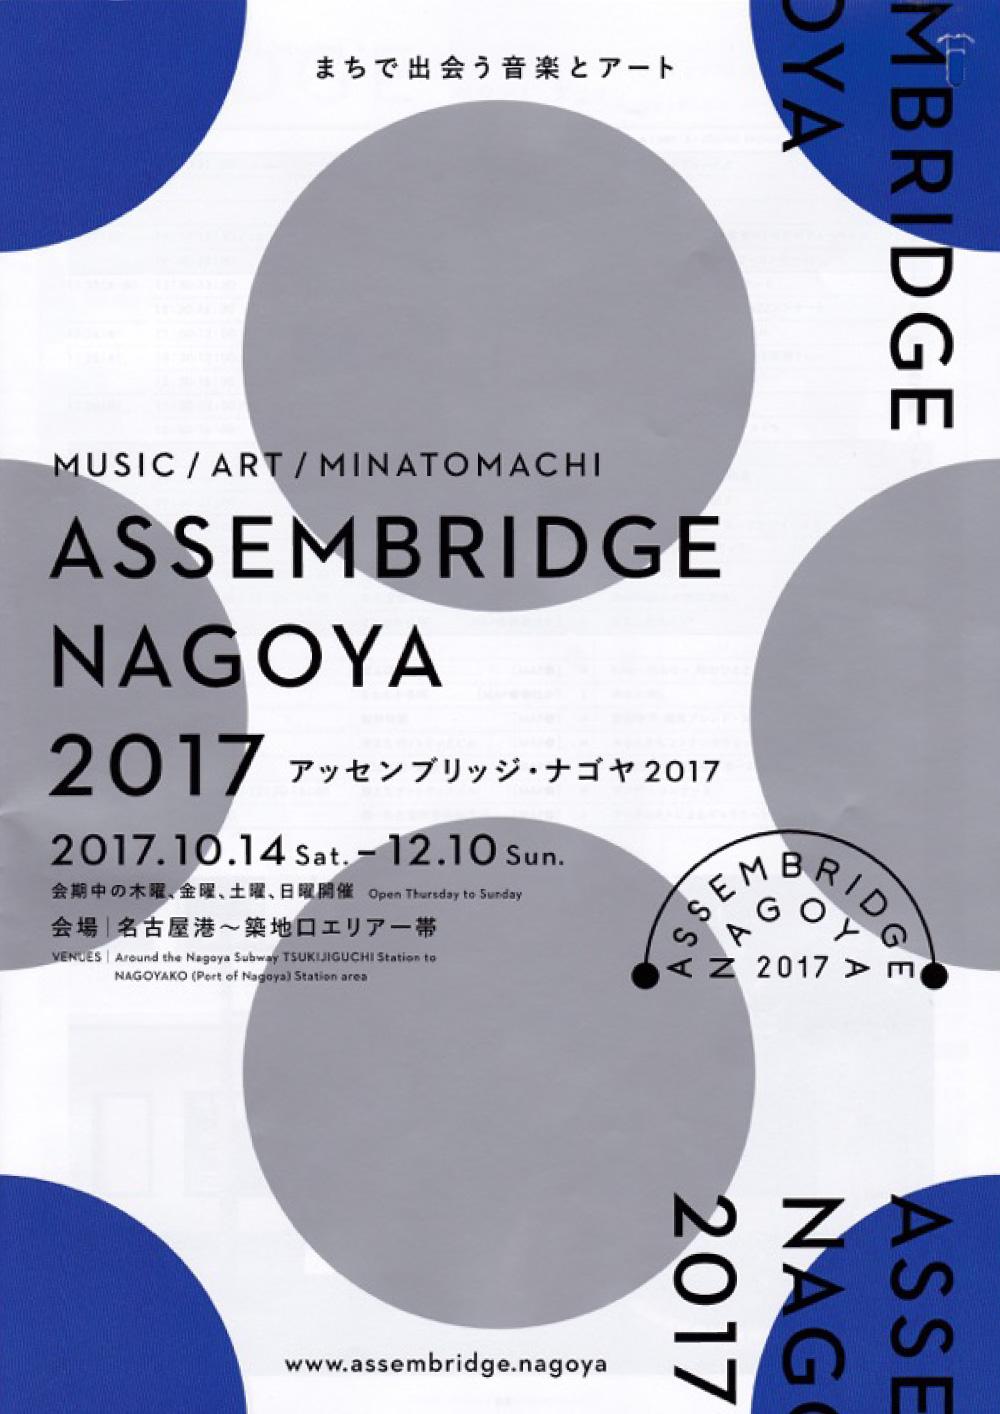 Assembridge Nagoya 2017